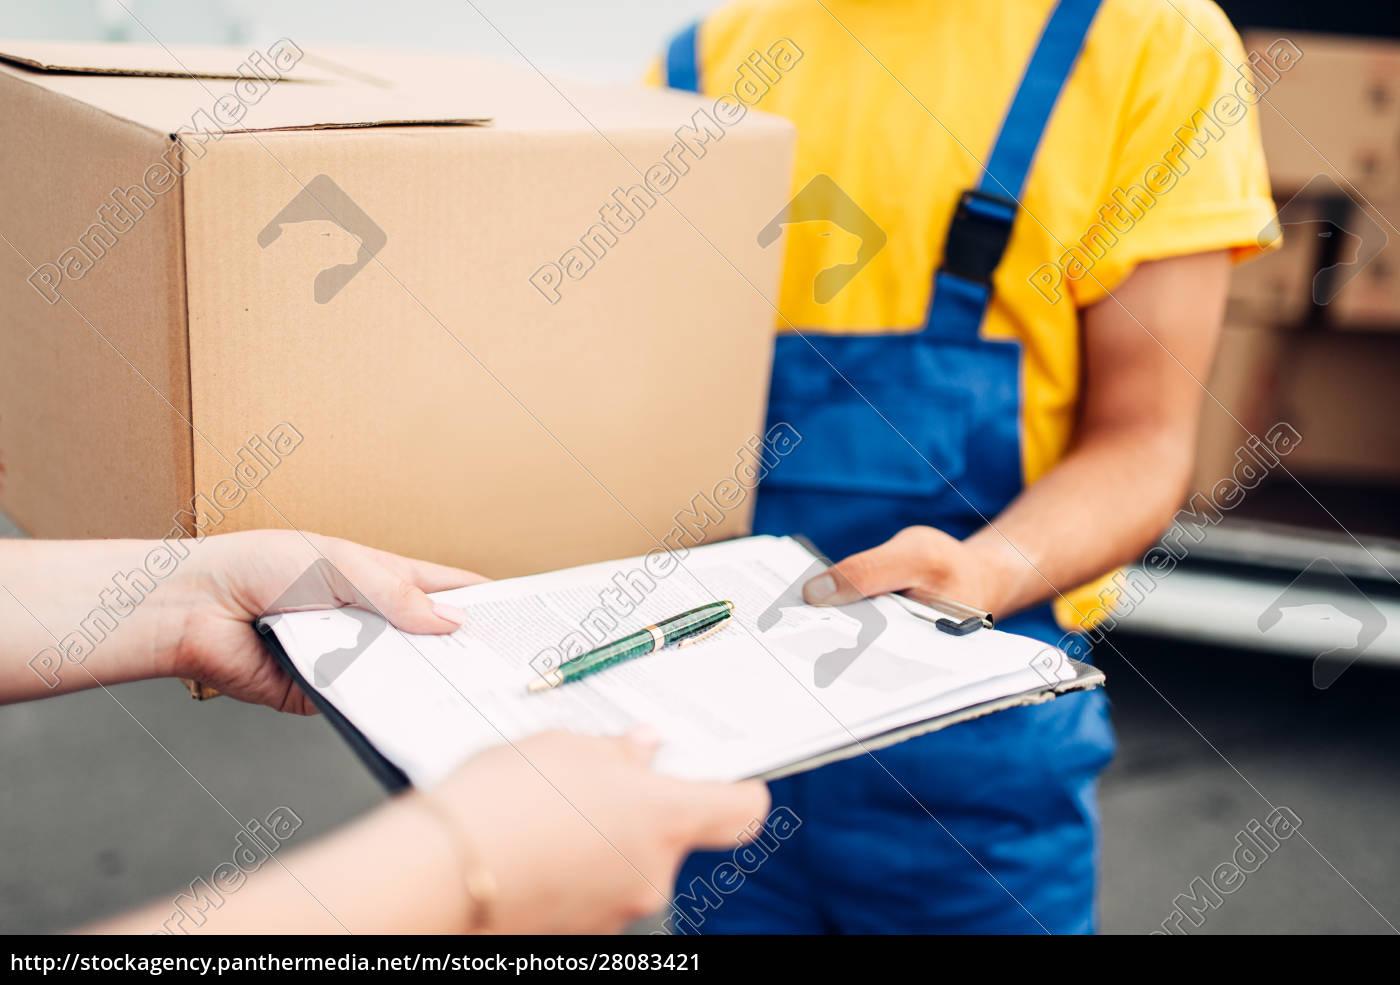 male, worker, in, uniform, gives, parcel - 28083421